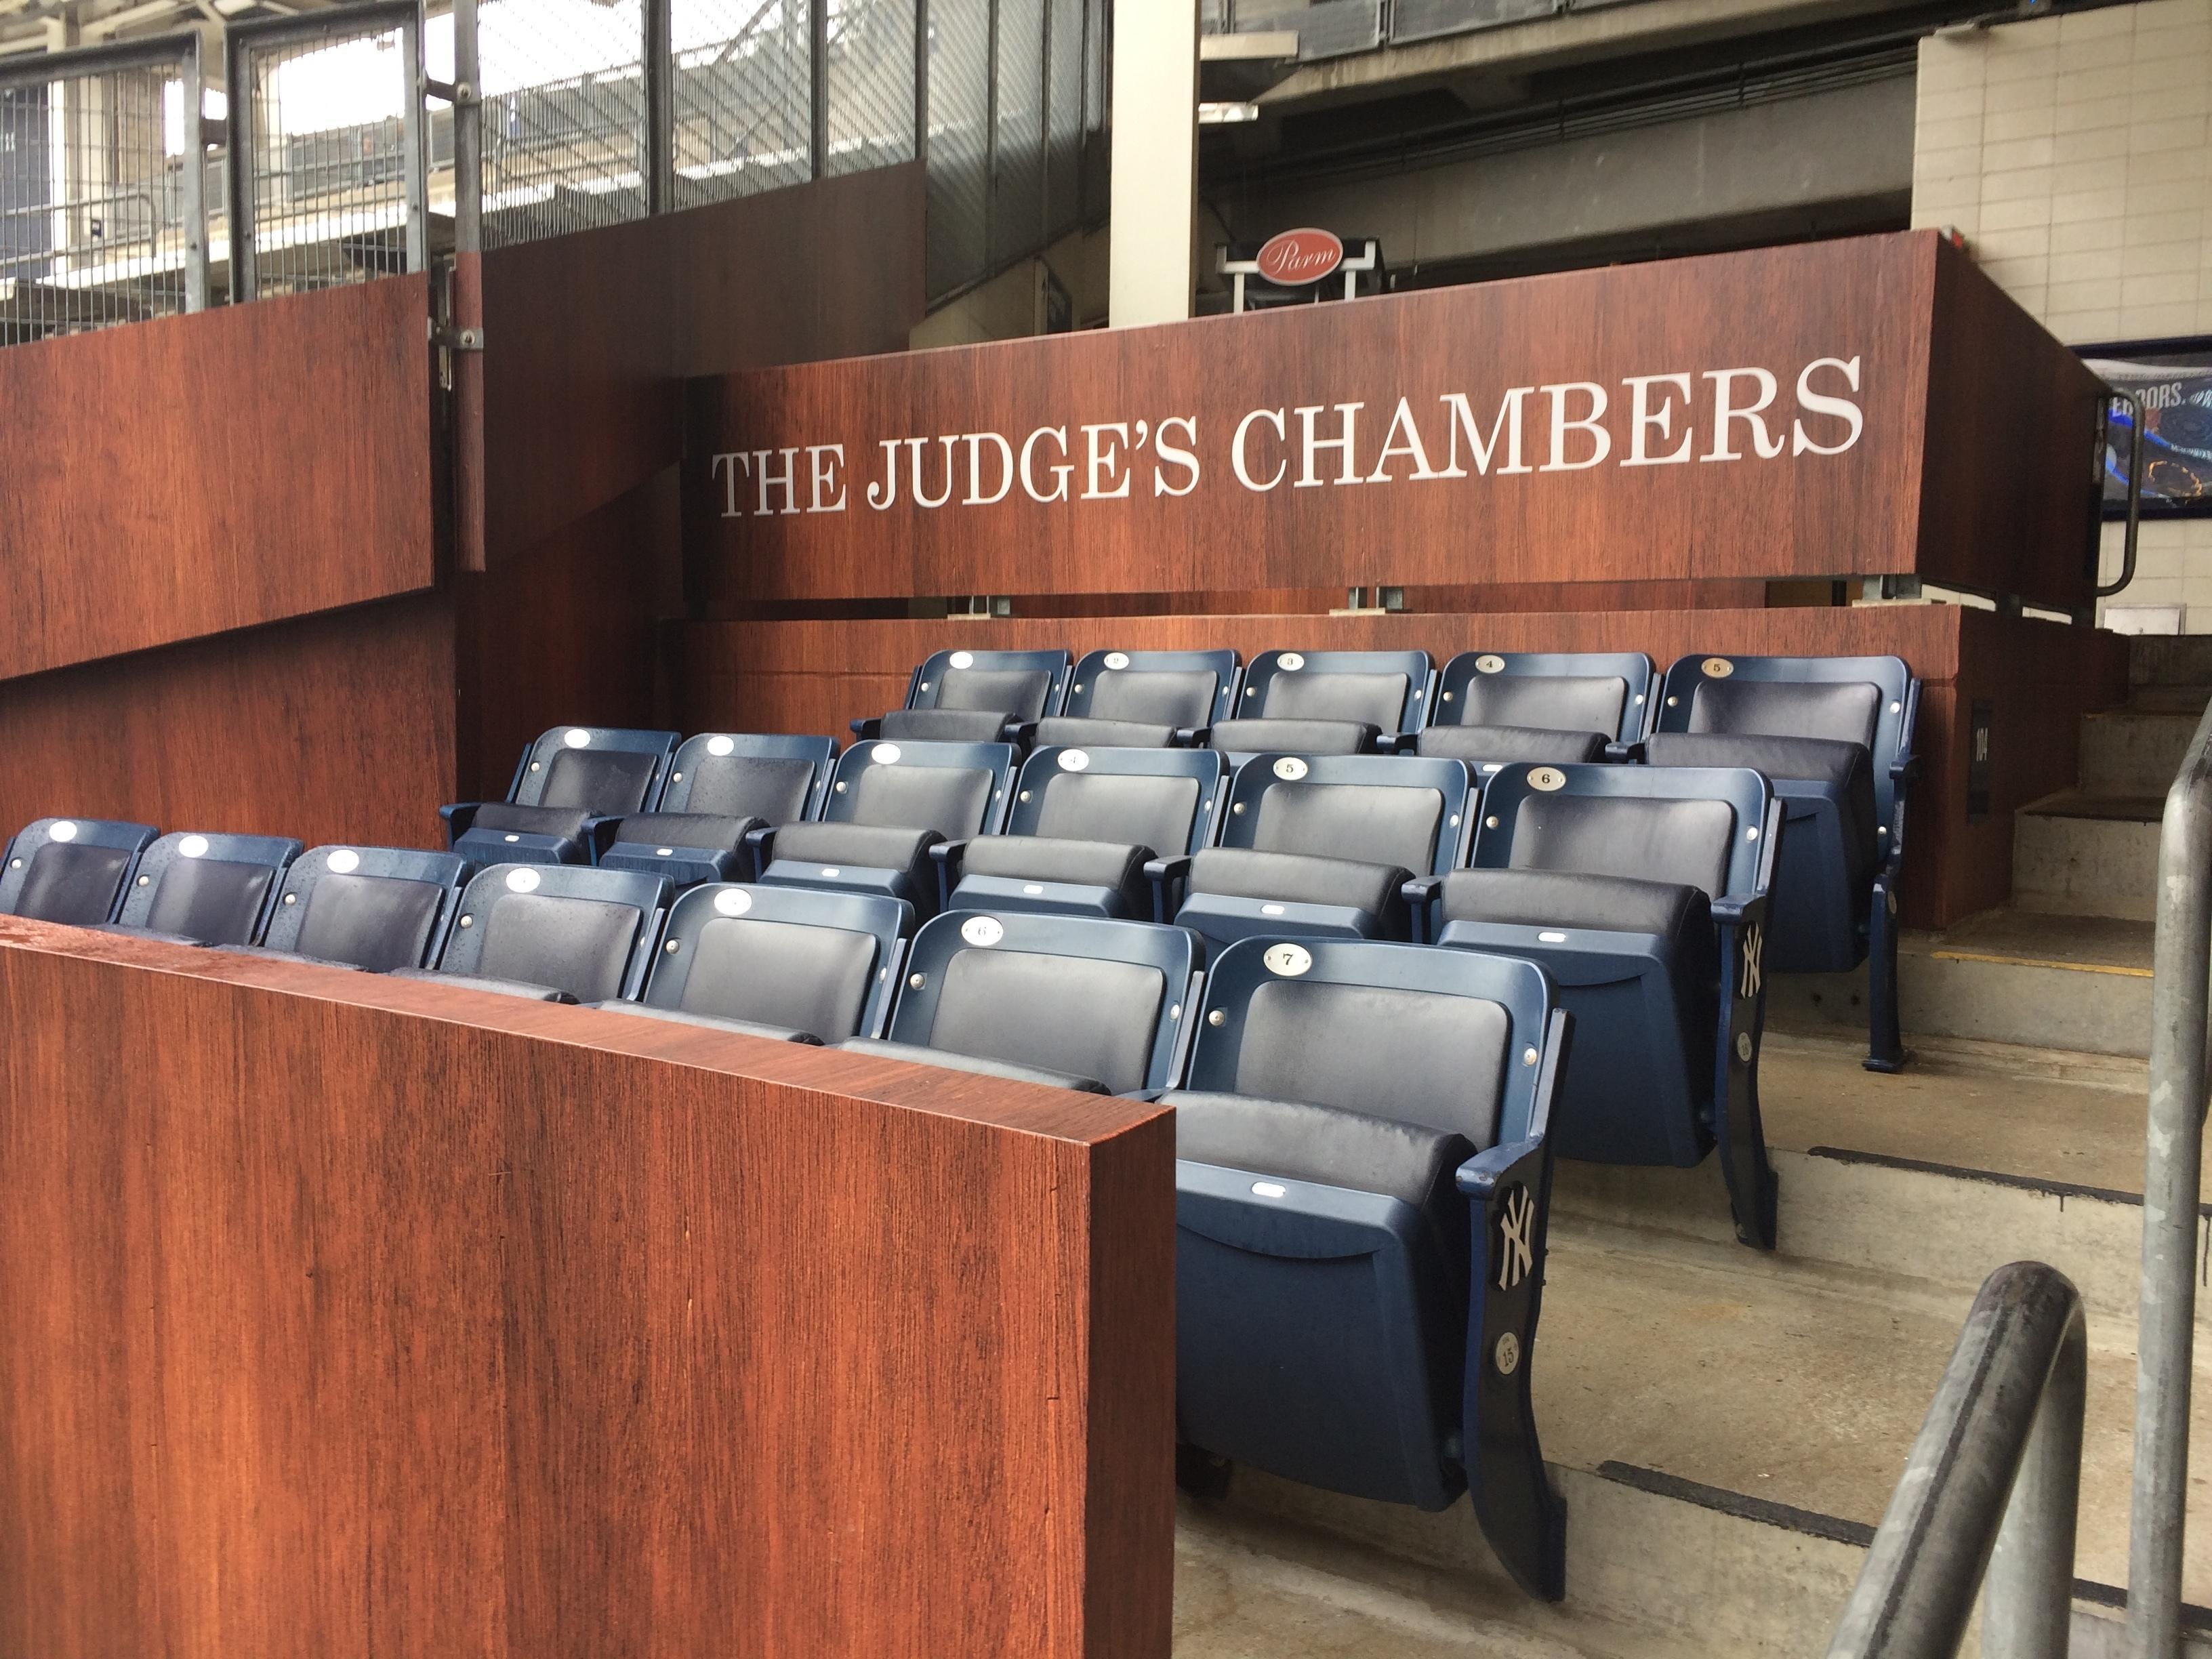 The_judges_chambers_baseball_28140